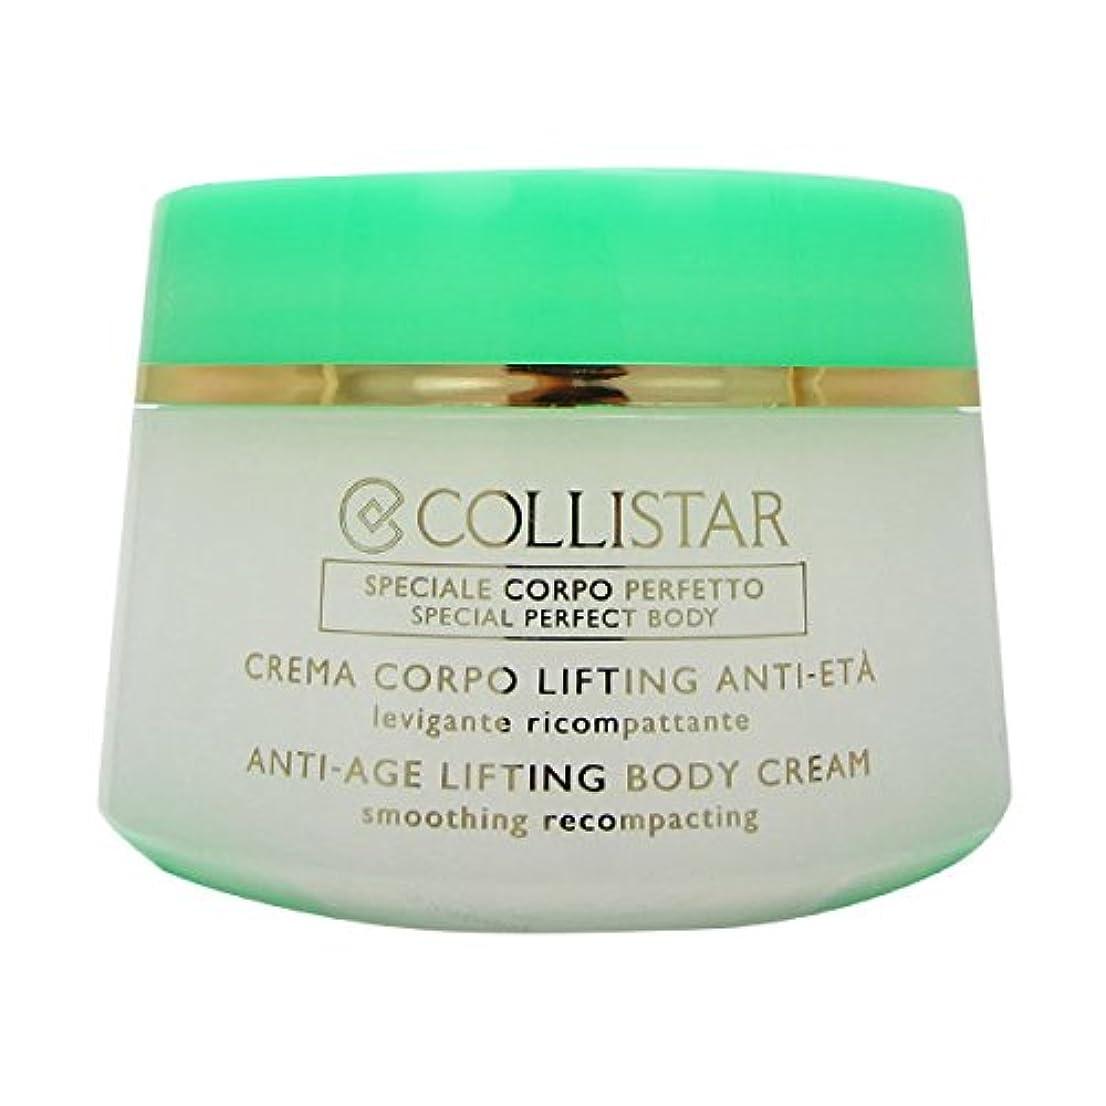 Collistar Anti-age Lifting Body Cream 400ml [並行輸入品]